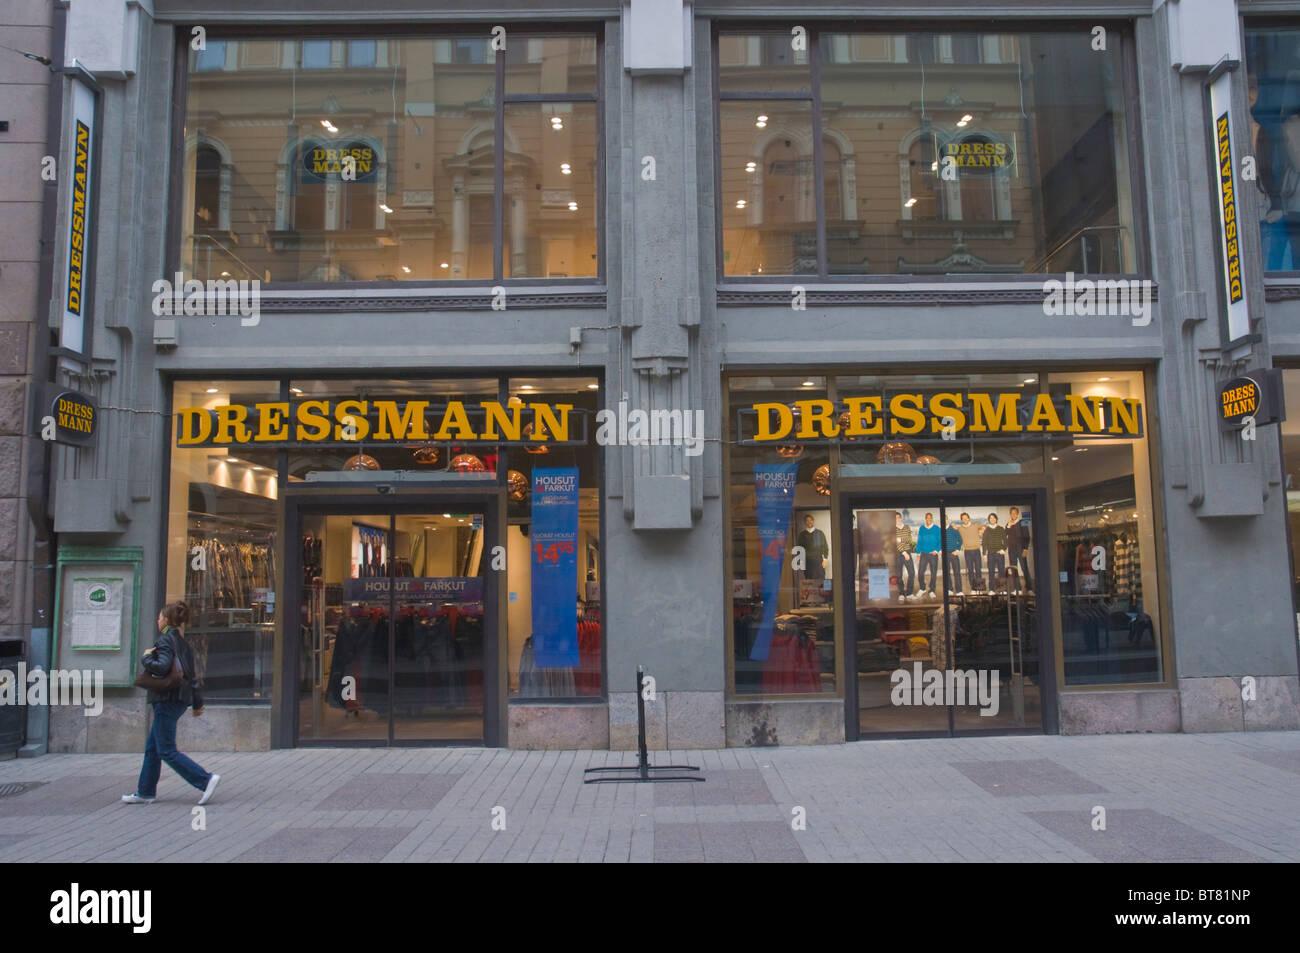 Dressman men's clothing store Aleksanterinkatu street central Helsinki Finland Europe - Stock Image